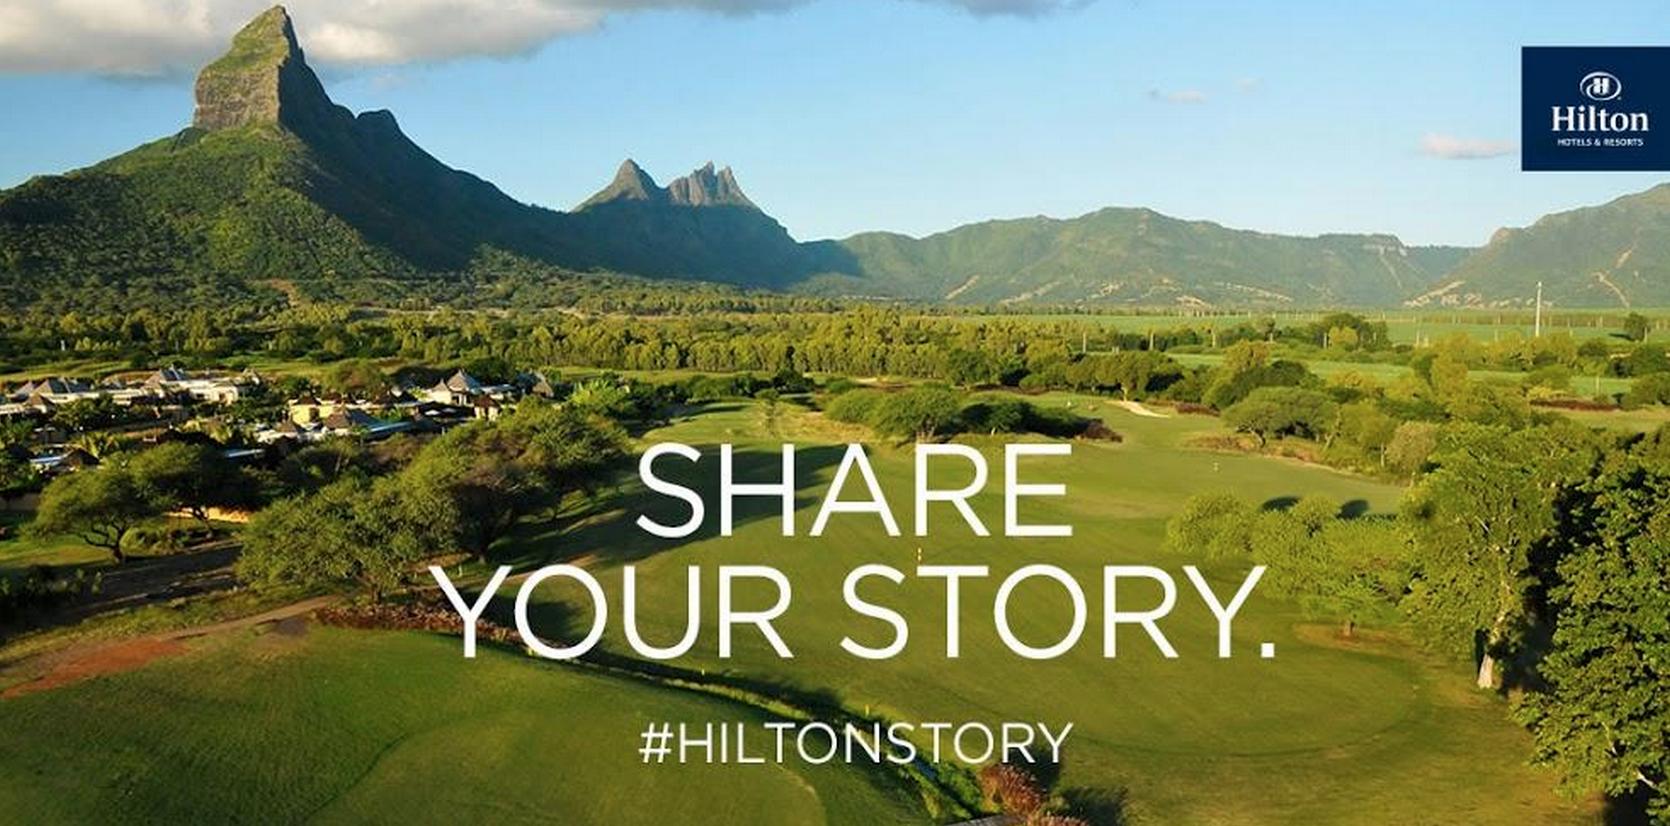 #hiltonstory